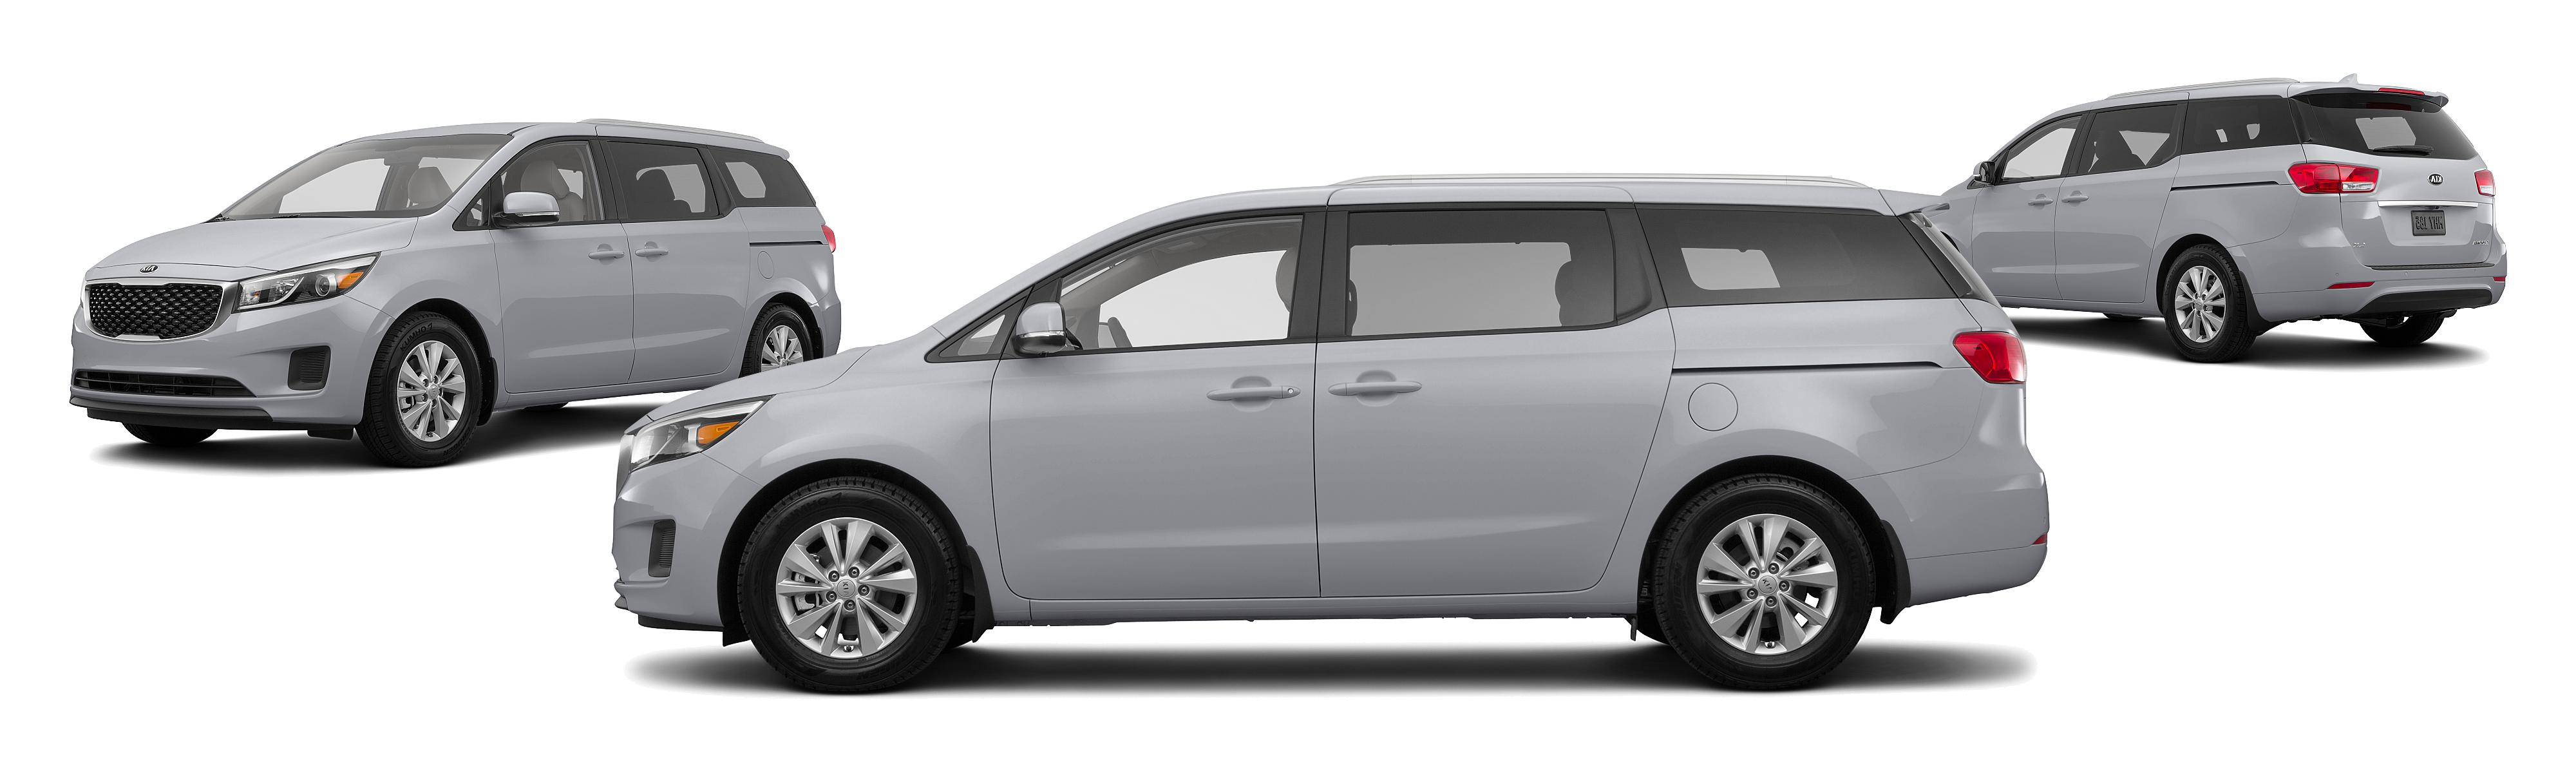 2017 Kia Sedona Lx 4dr Mini Van Research Groovecar